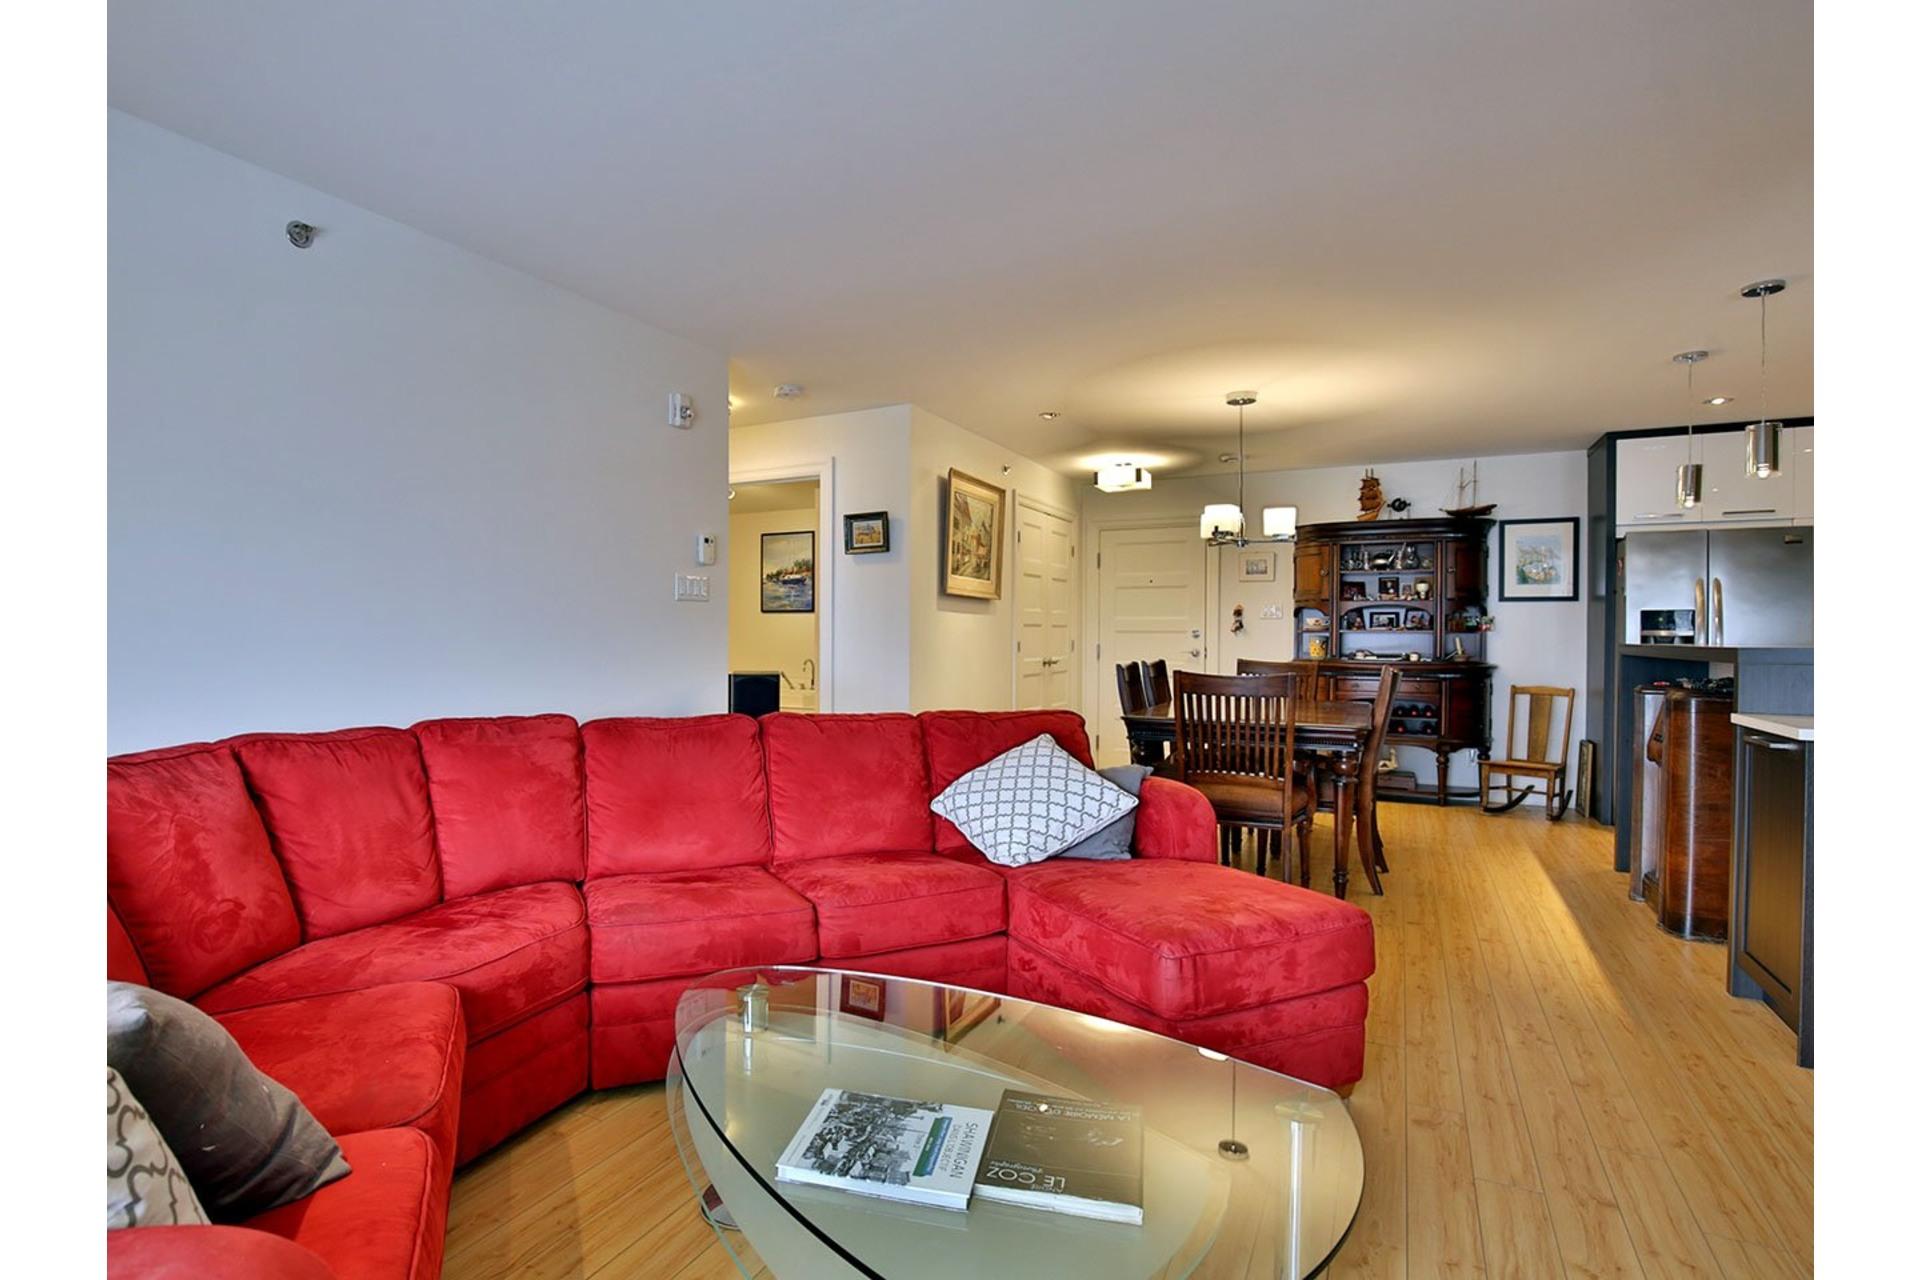 image 11 - Apartment For sale Varennes - 5 rooms